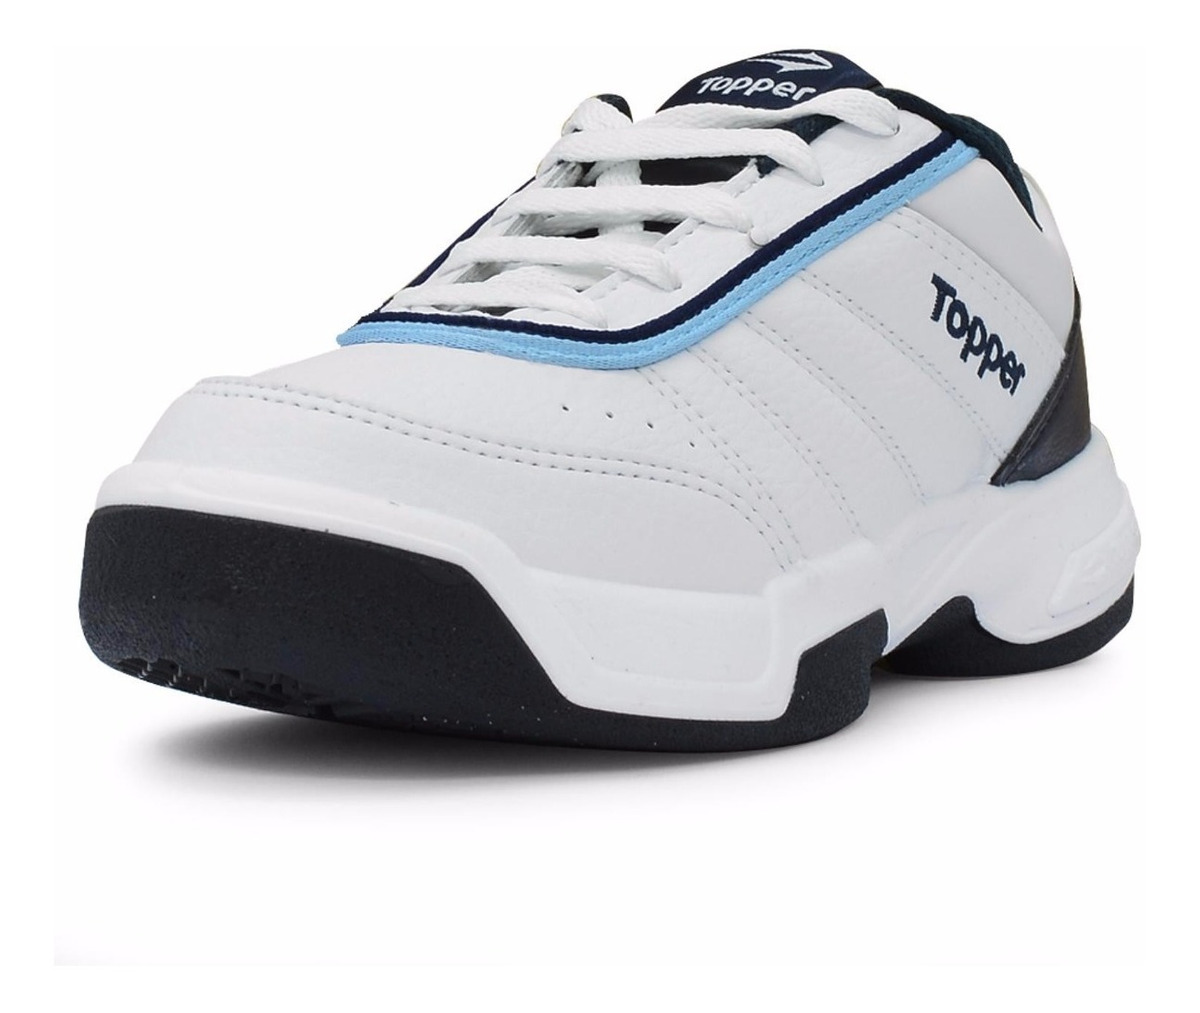 5a8655a2db Zapatillas Topper Modelo Tenis Tie Break 3 Blanco/azul - $ 1.999,00 ...